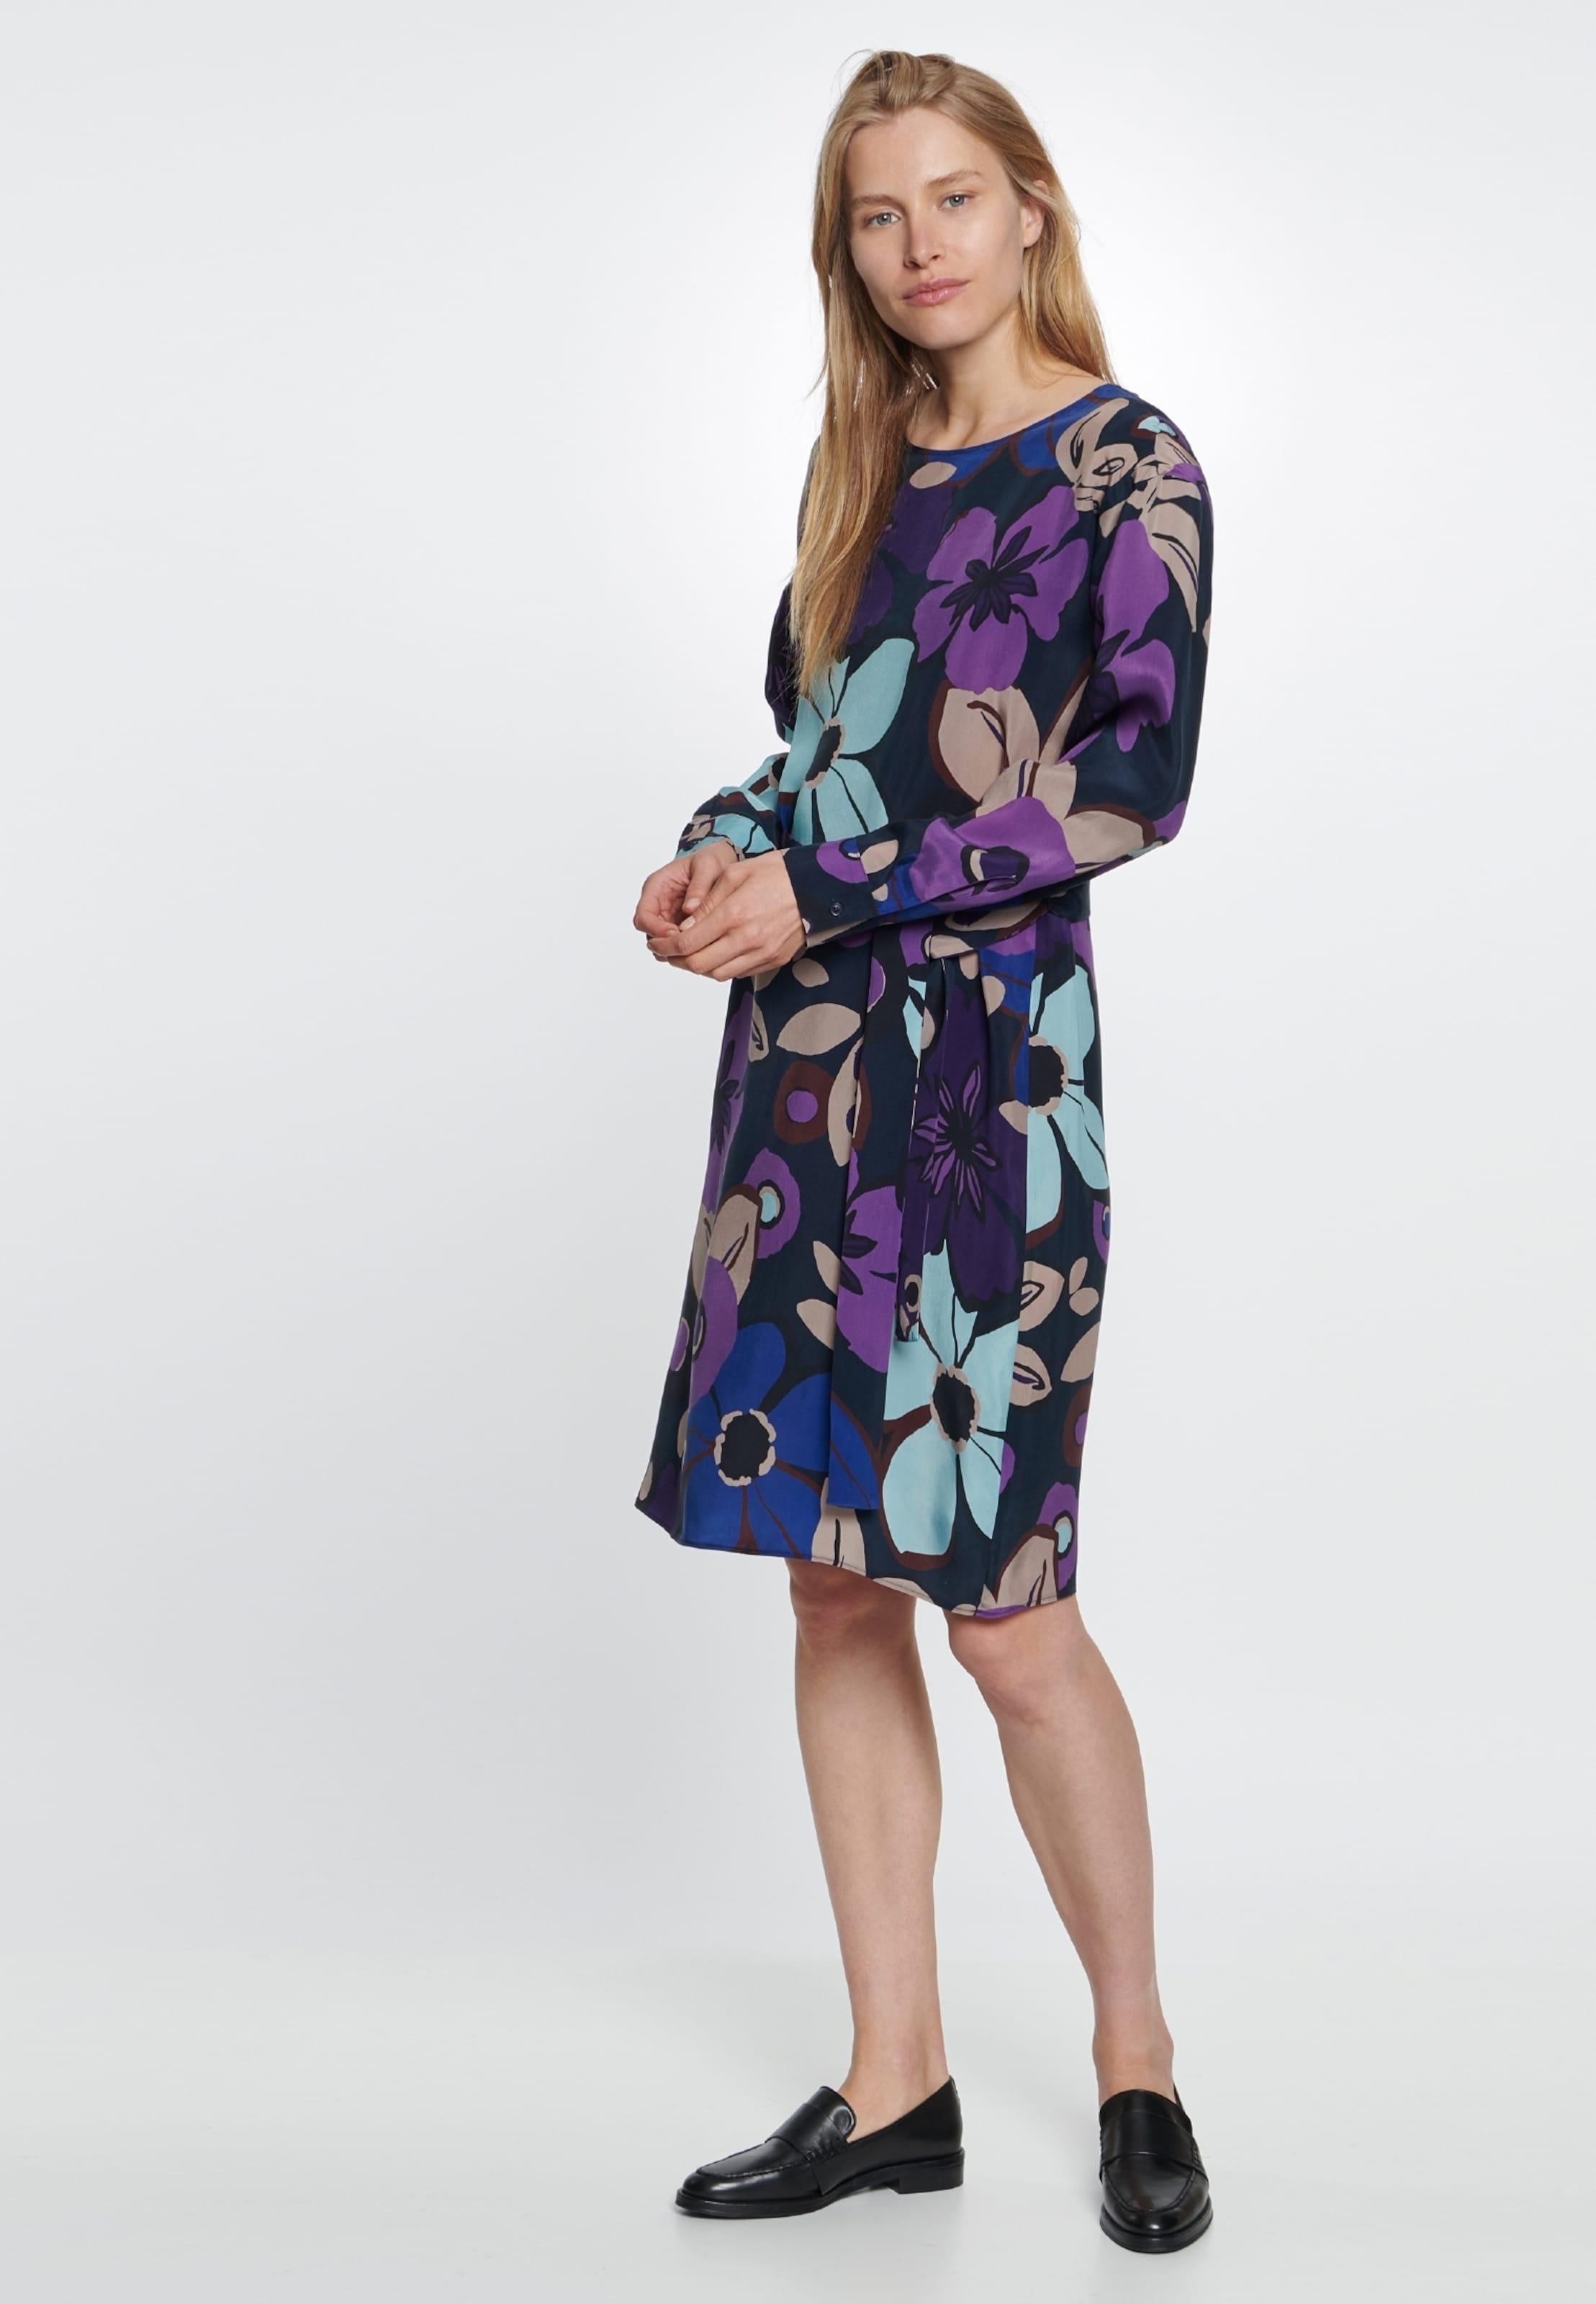 In BlauAzur Dunkellila Seidensticker Orchidee 'schwarze Dunkelblau Rose' Kleid GSUMqpVz